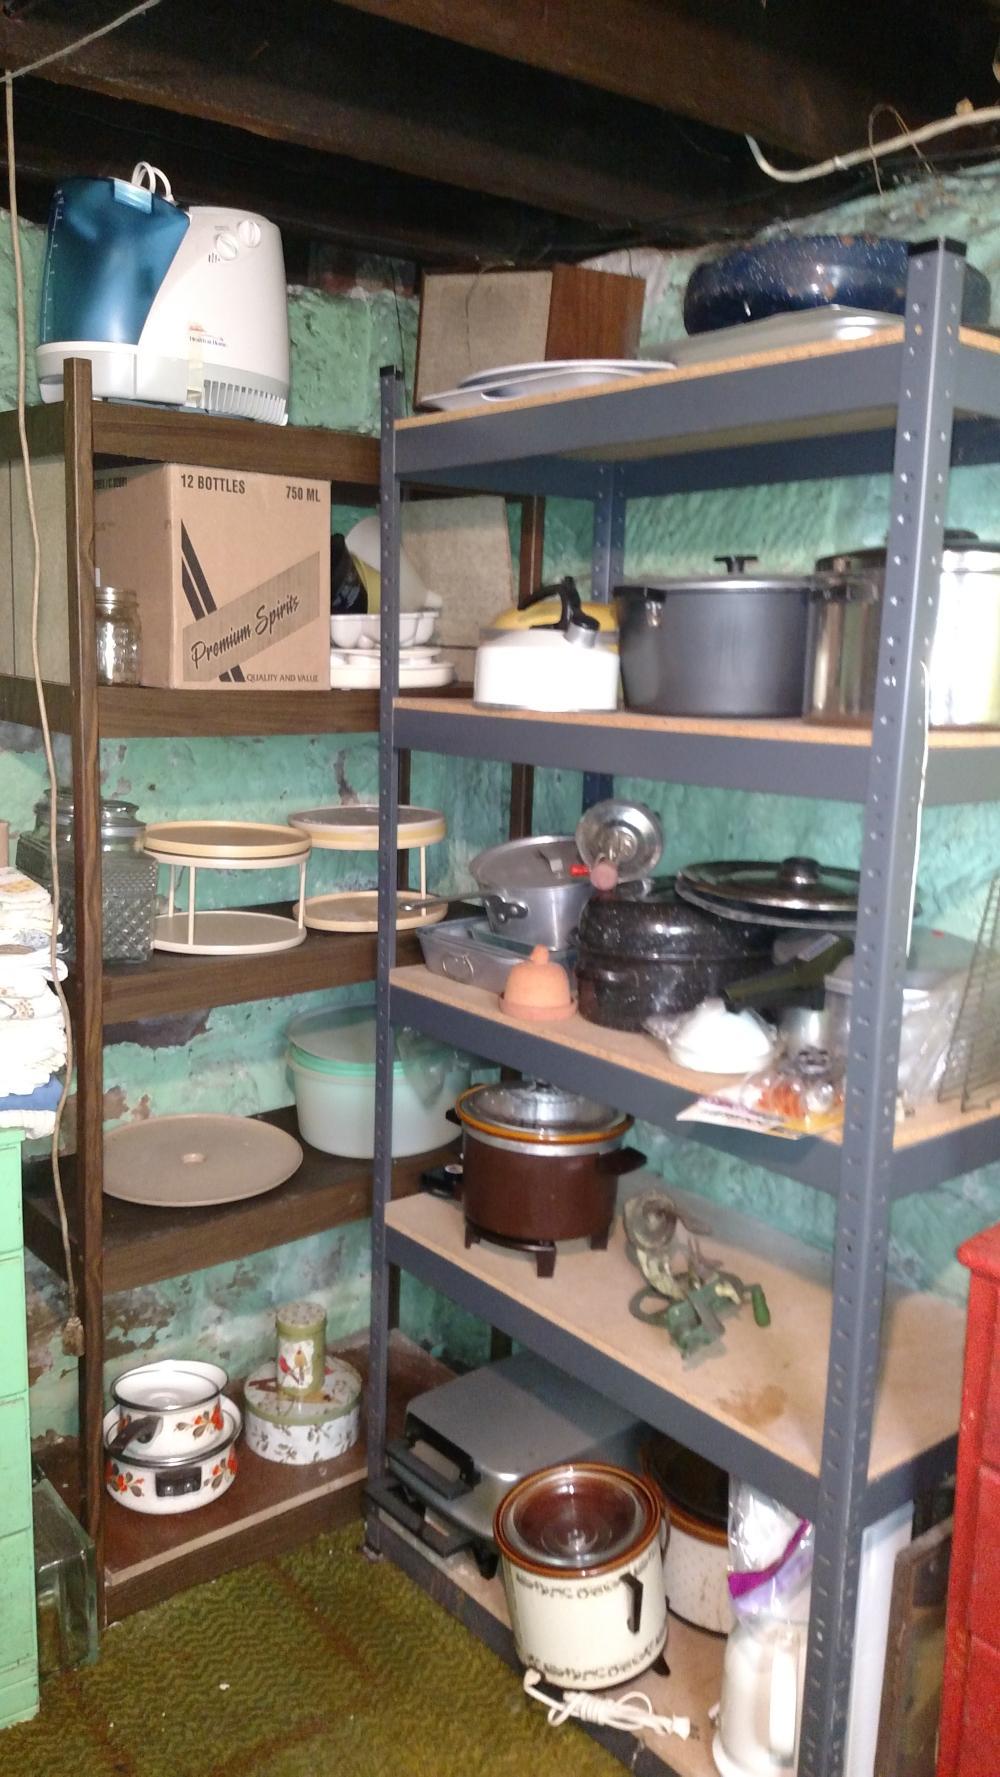 shelf contents,- contents only- apple peeler, crock pots, jars w/ glass lids, gevelia coffee maker, roaster, misc kithenwares